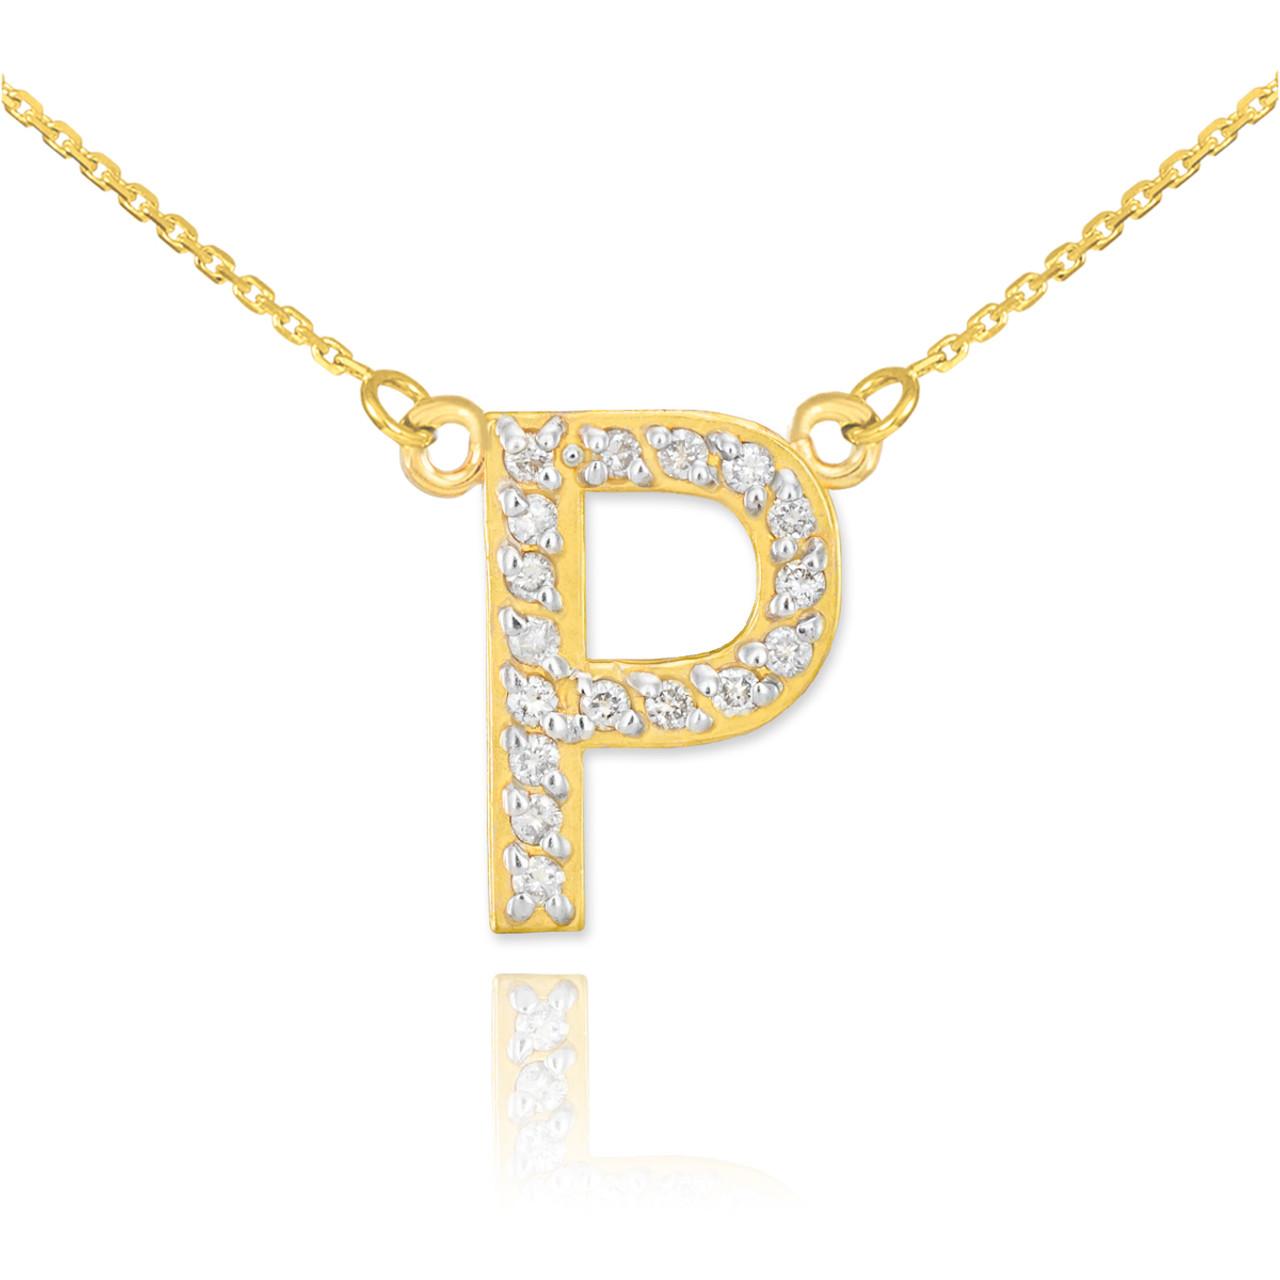 14k gold letter quotpquot diamond initial necklace for 14k gold letter necklace